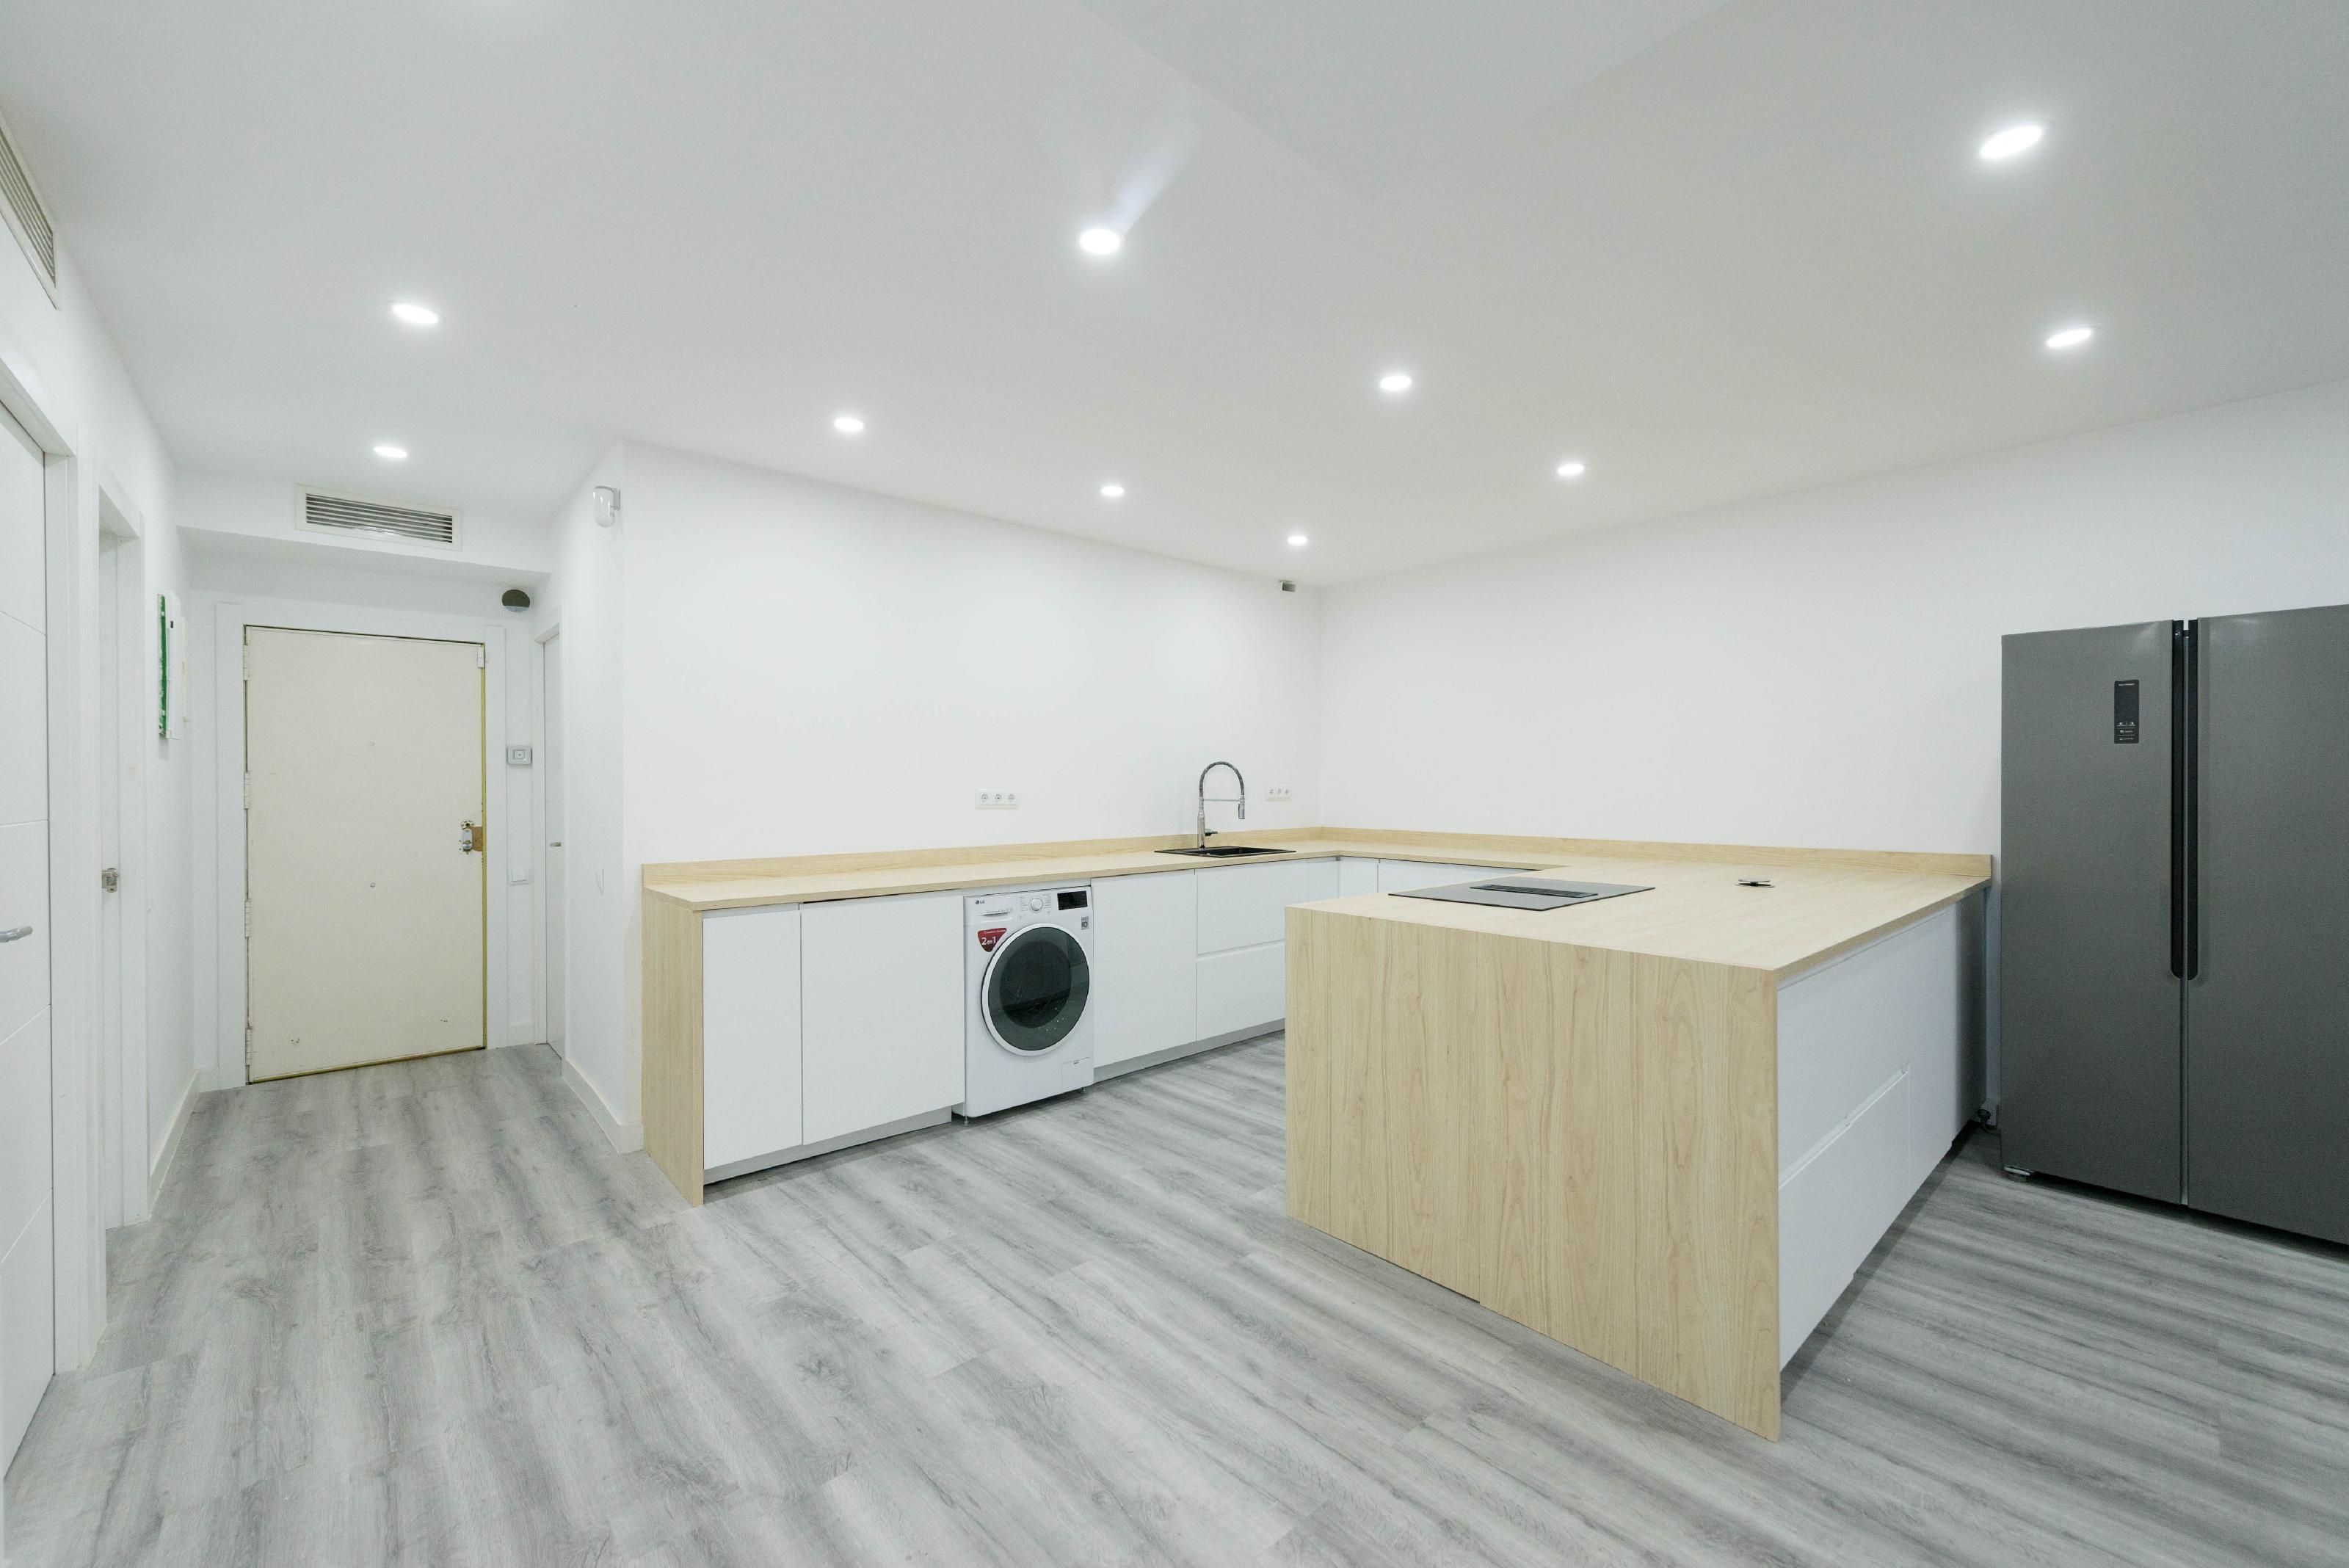 242980 Flat for sale in Eixample, Sagrada Familia 4